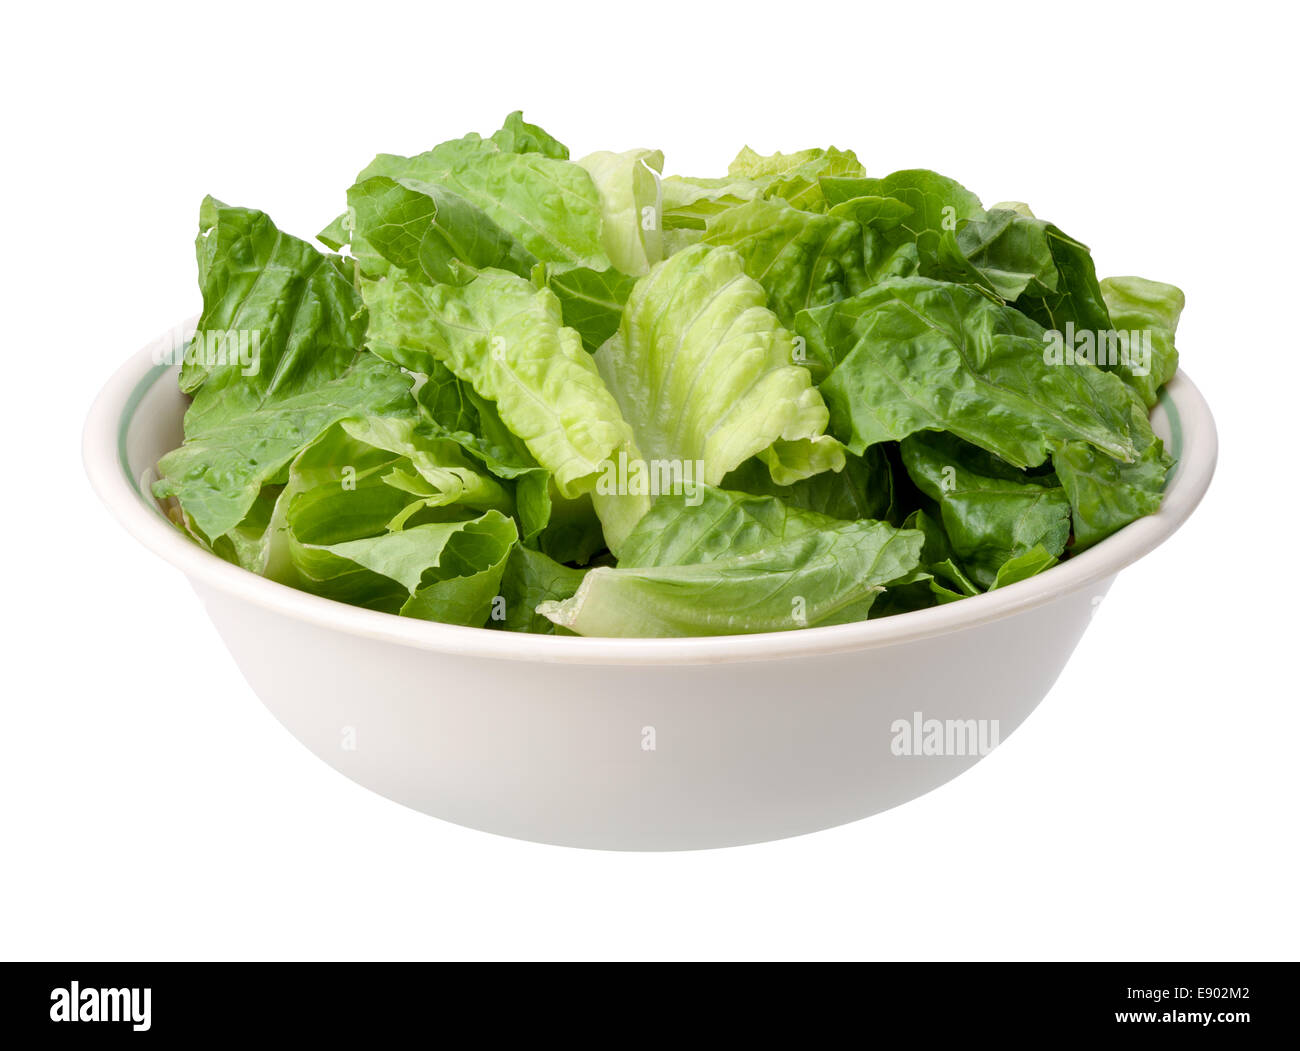 Romaine Salad Bowl isolated on a white background. - Stock Image